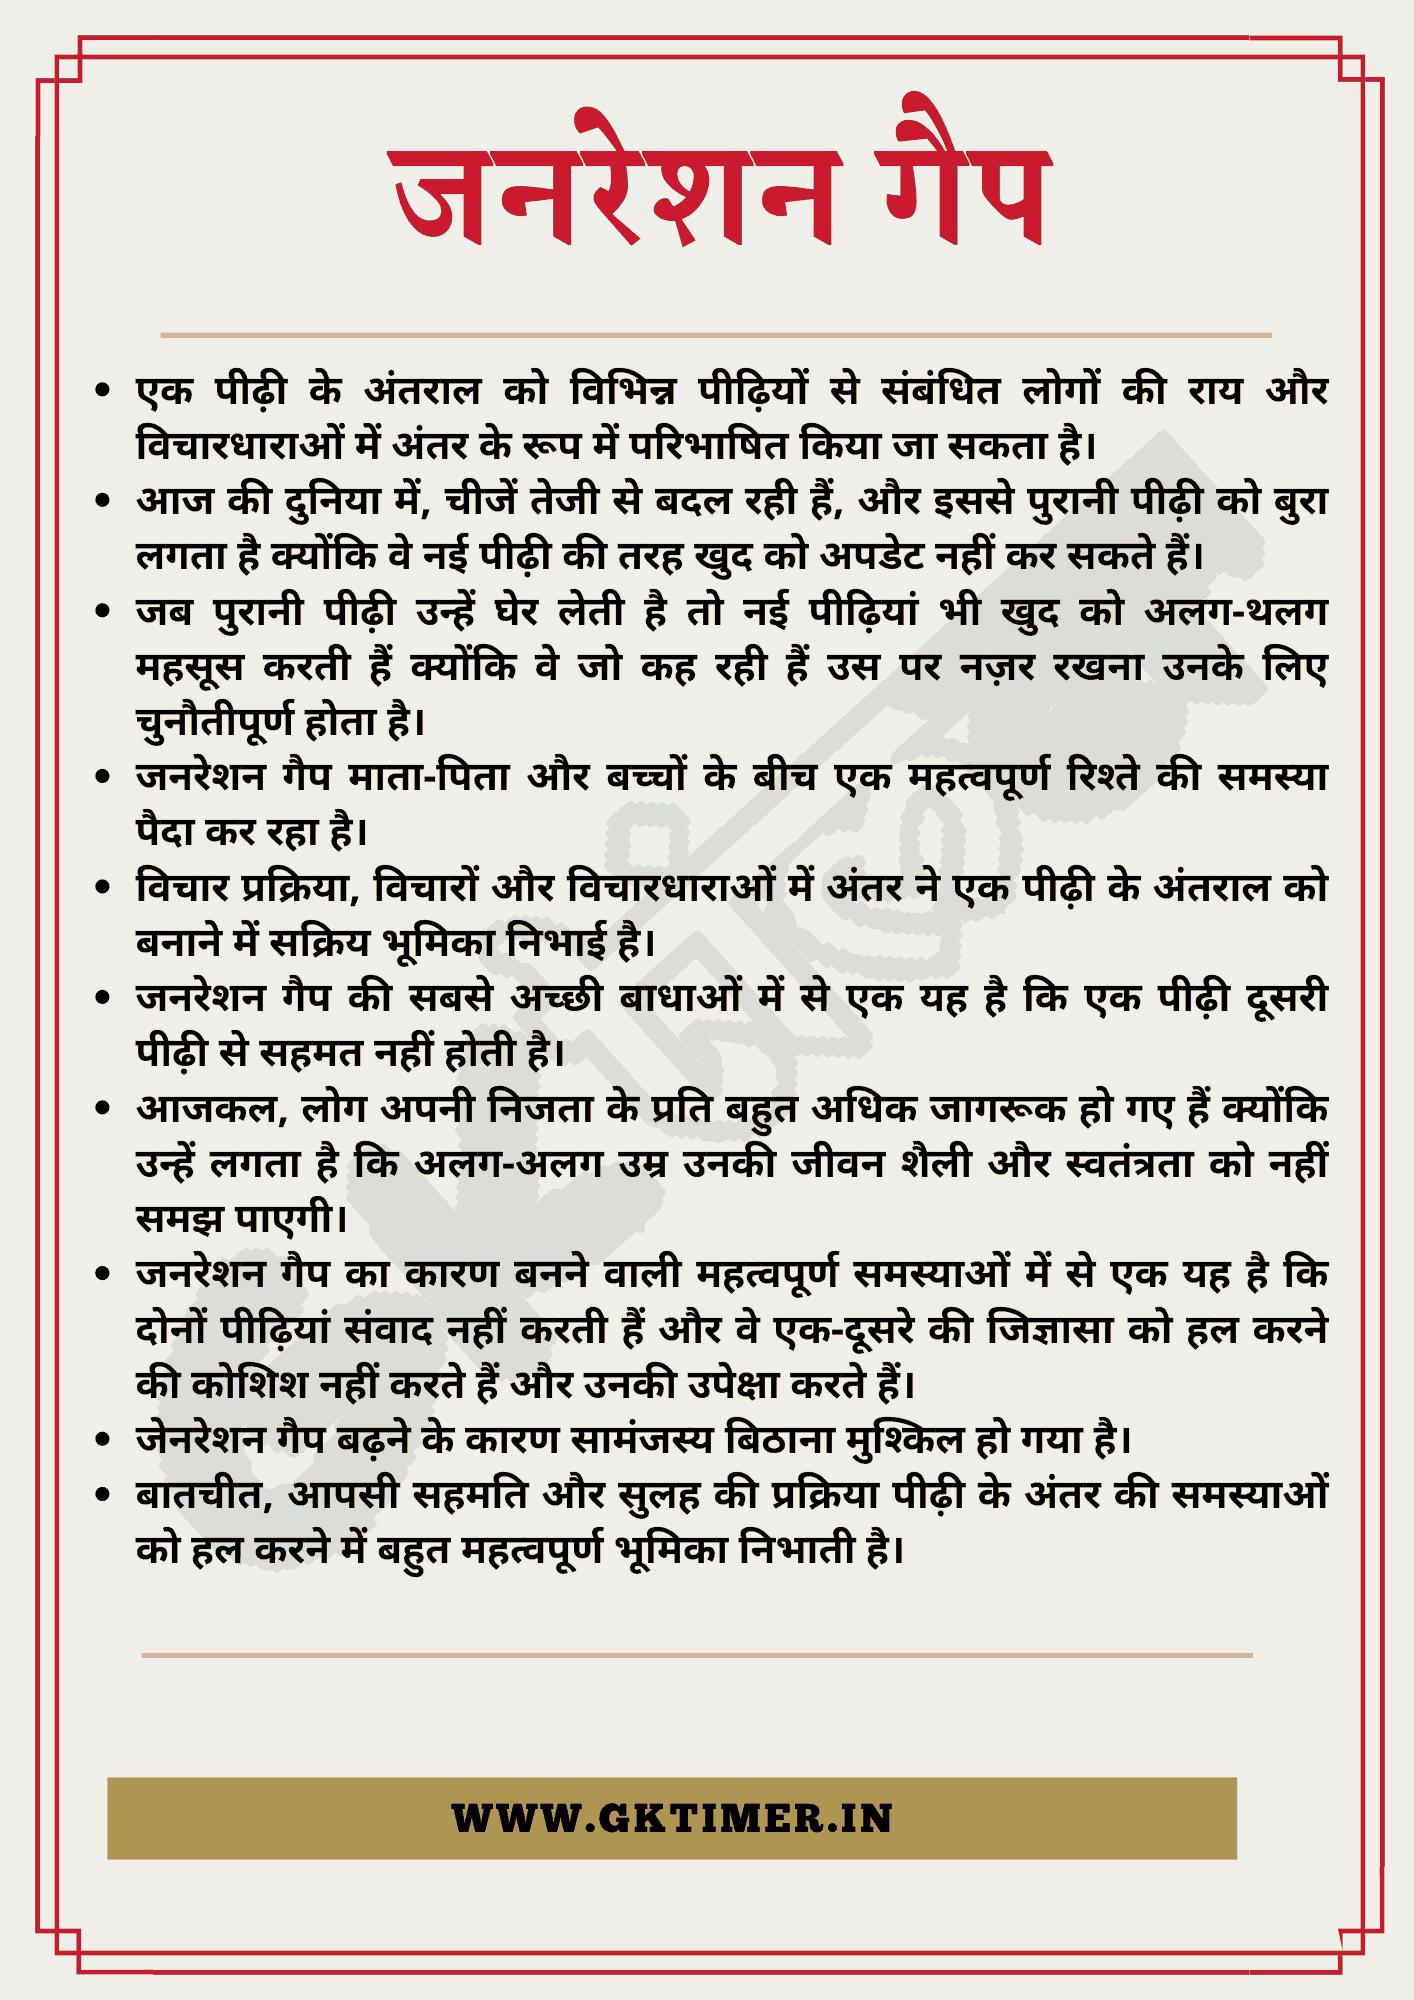 जनरेशन गैप पर निबंध | Long and Short Essay on Generation Gap in Hindi | 10 Lines on Generation Gap in Hindi